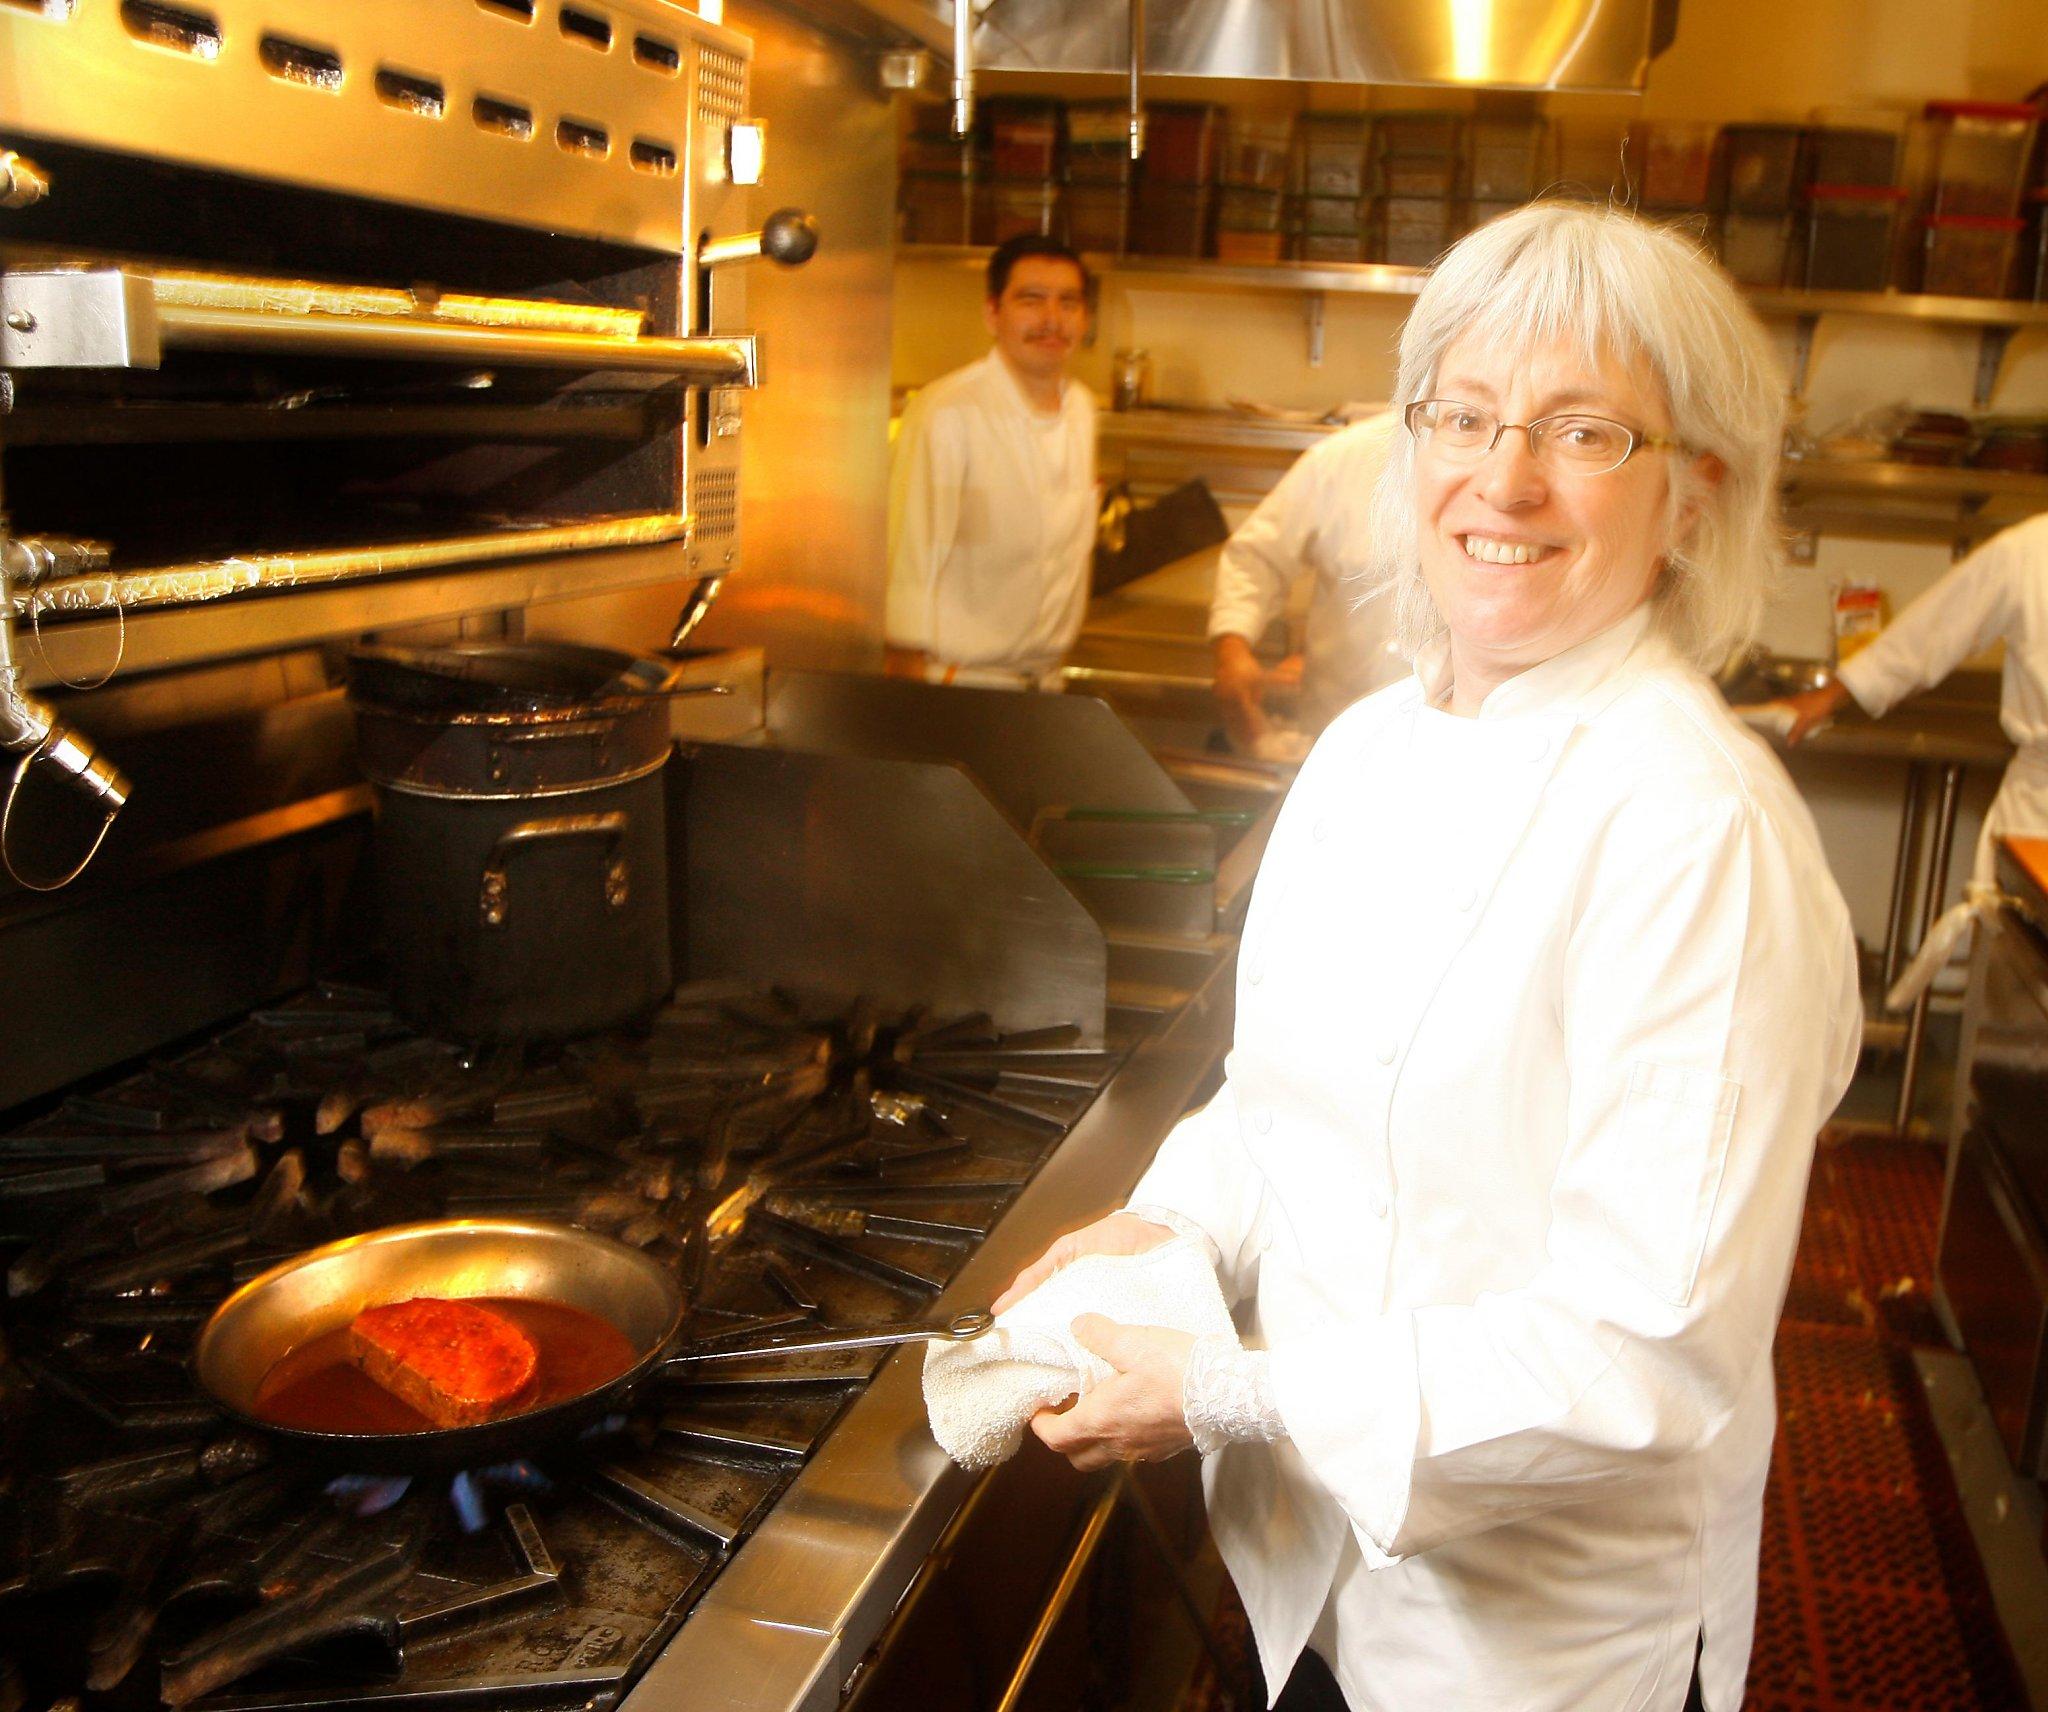 napa valley restaurant cindys backstreet kitchen to close sfchroniclecom - Cindys Backstreet Kitchen